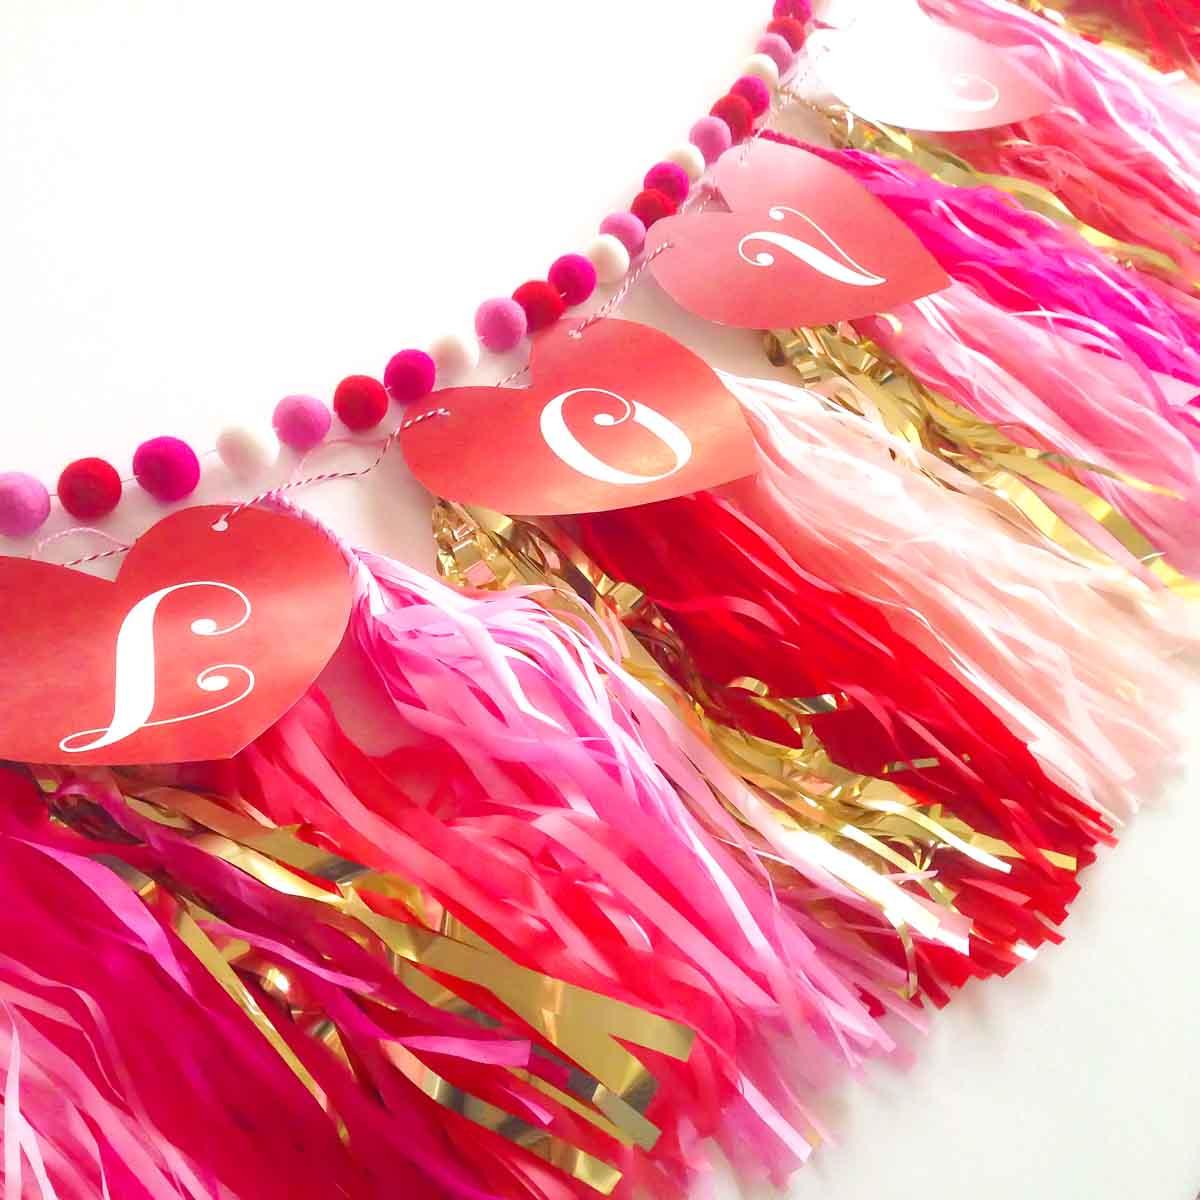 Valentine's Day heart banner + tissue tassels + felt balls